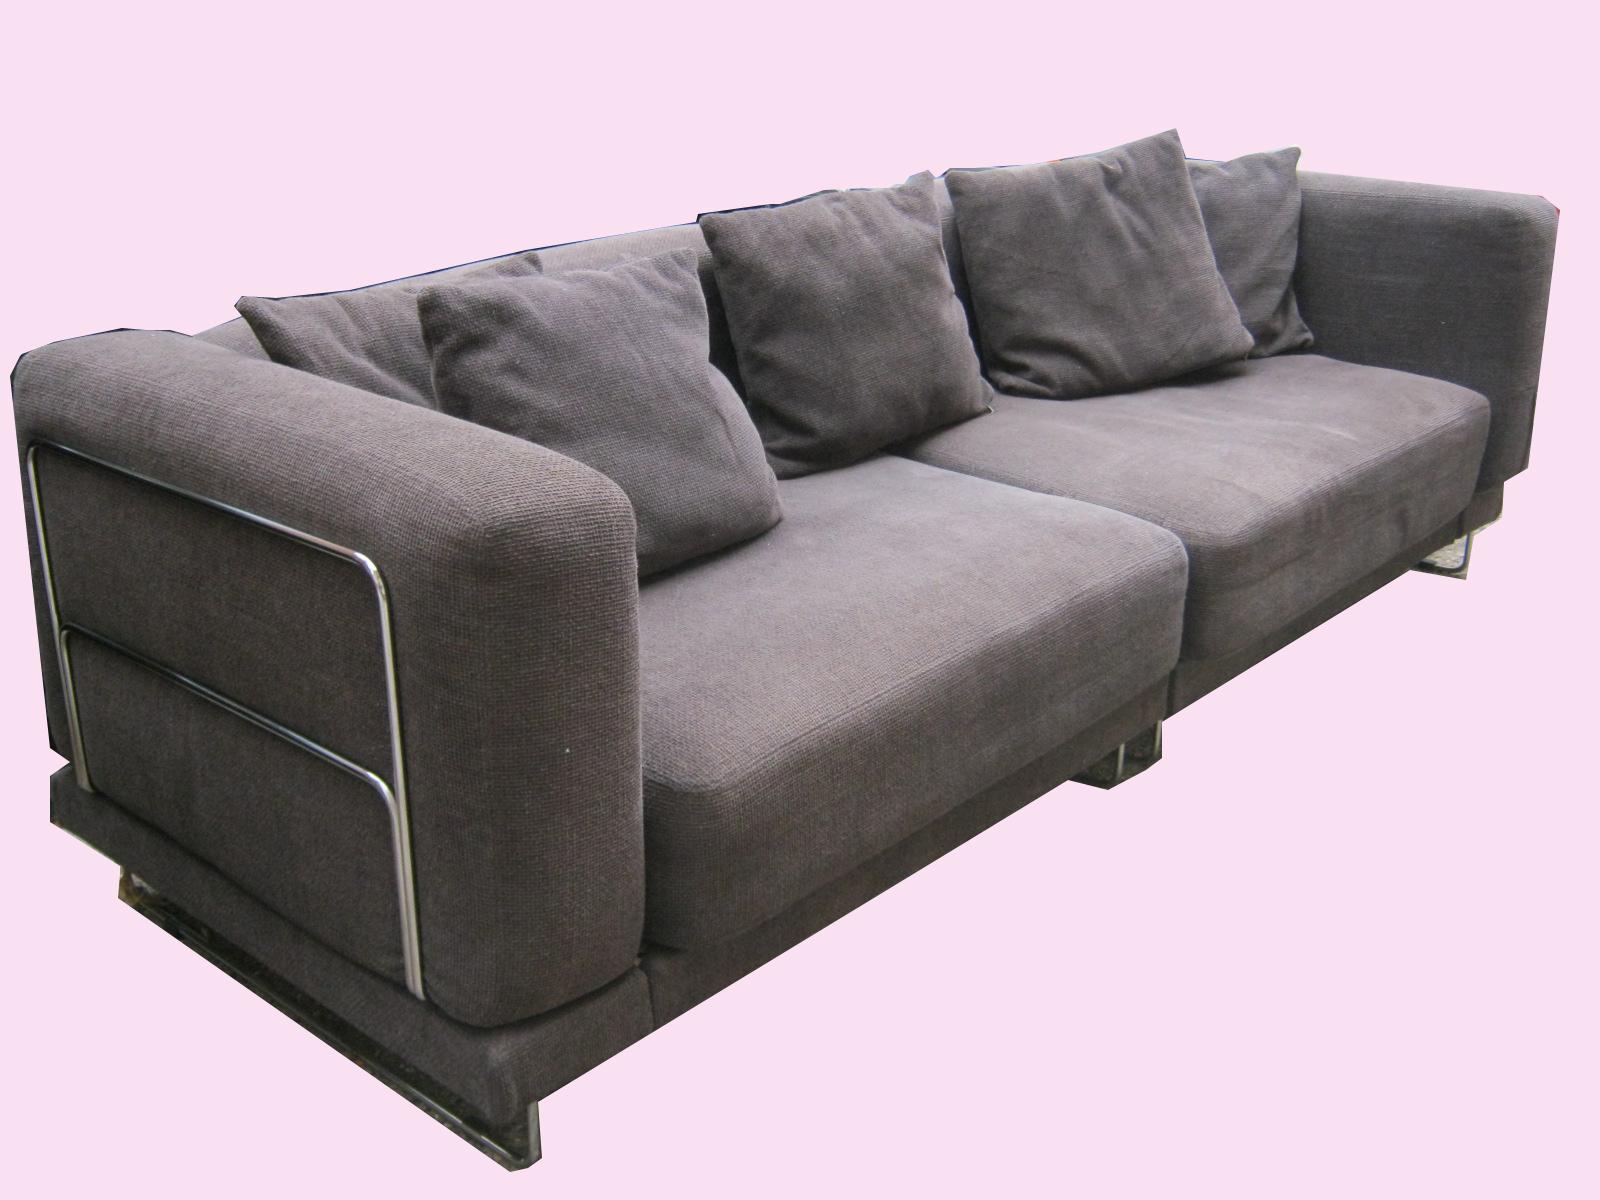 ikea tylosand sofa broyhill 50 auf tylösand sofas bei thesofa